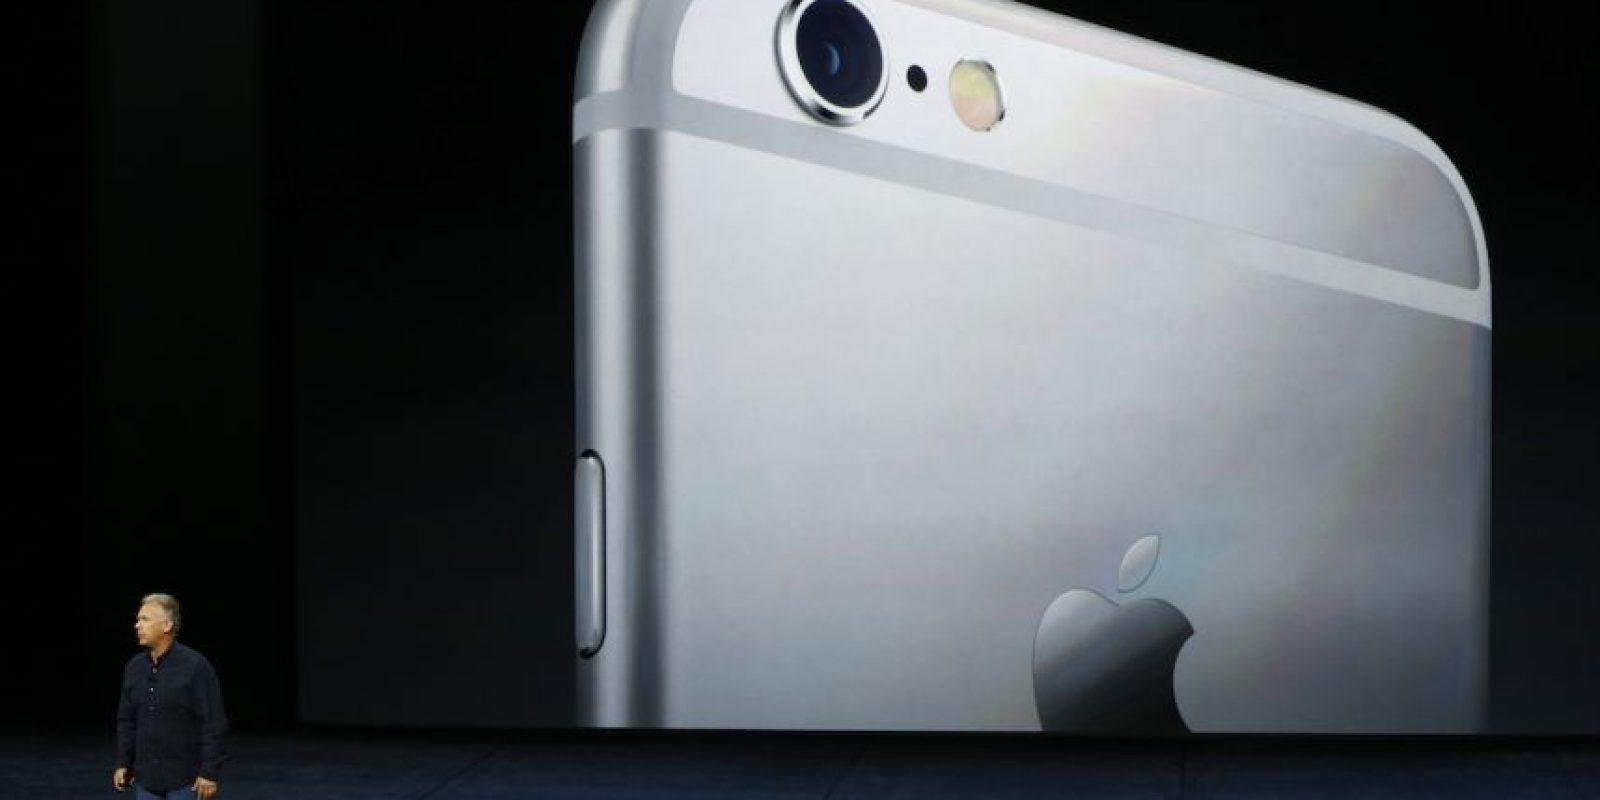 La cámara posterior es de 12 megapíxeles. Foto:Getty Images